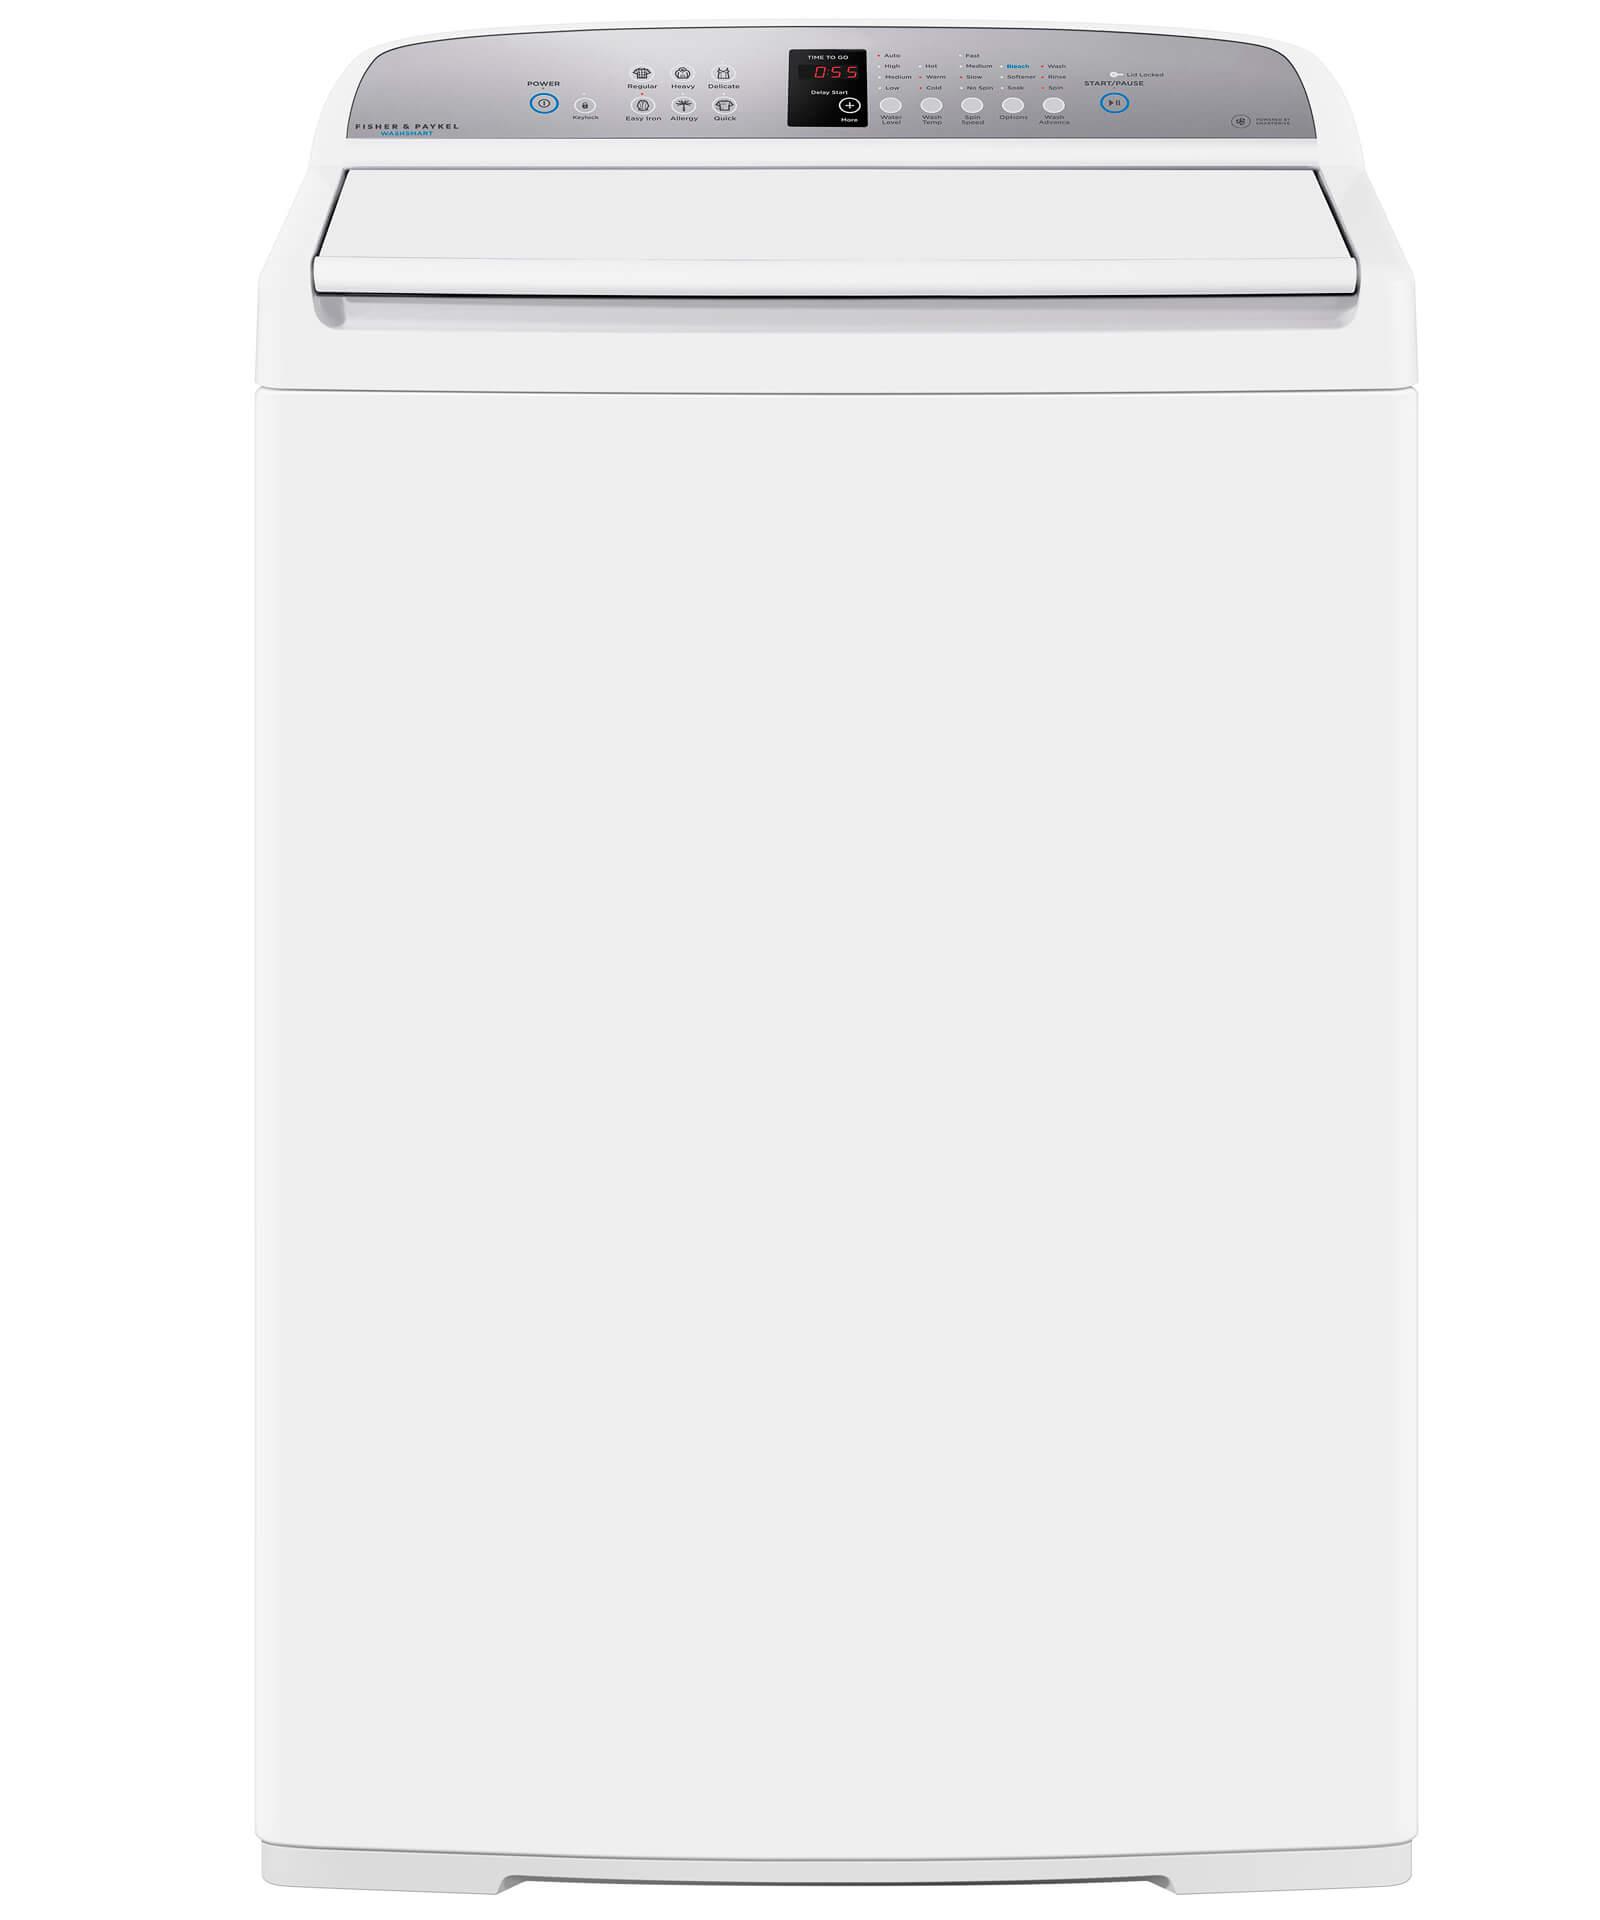 Top Loader Washing Machine, 3.9 cu ft WashSmart™